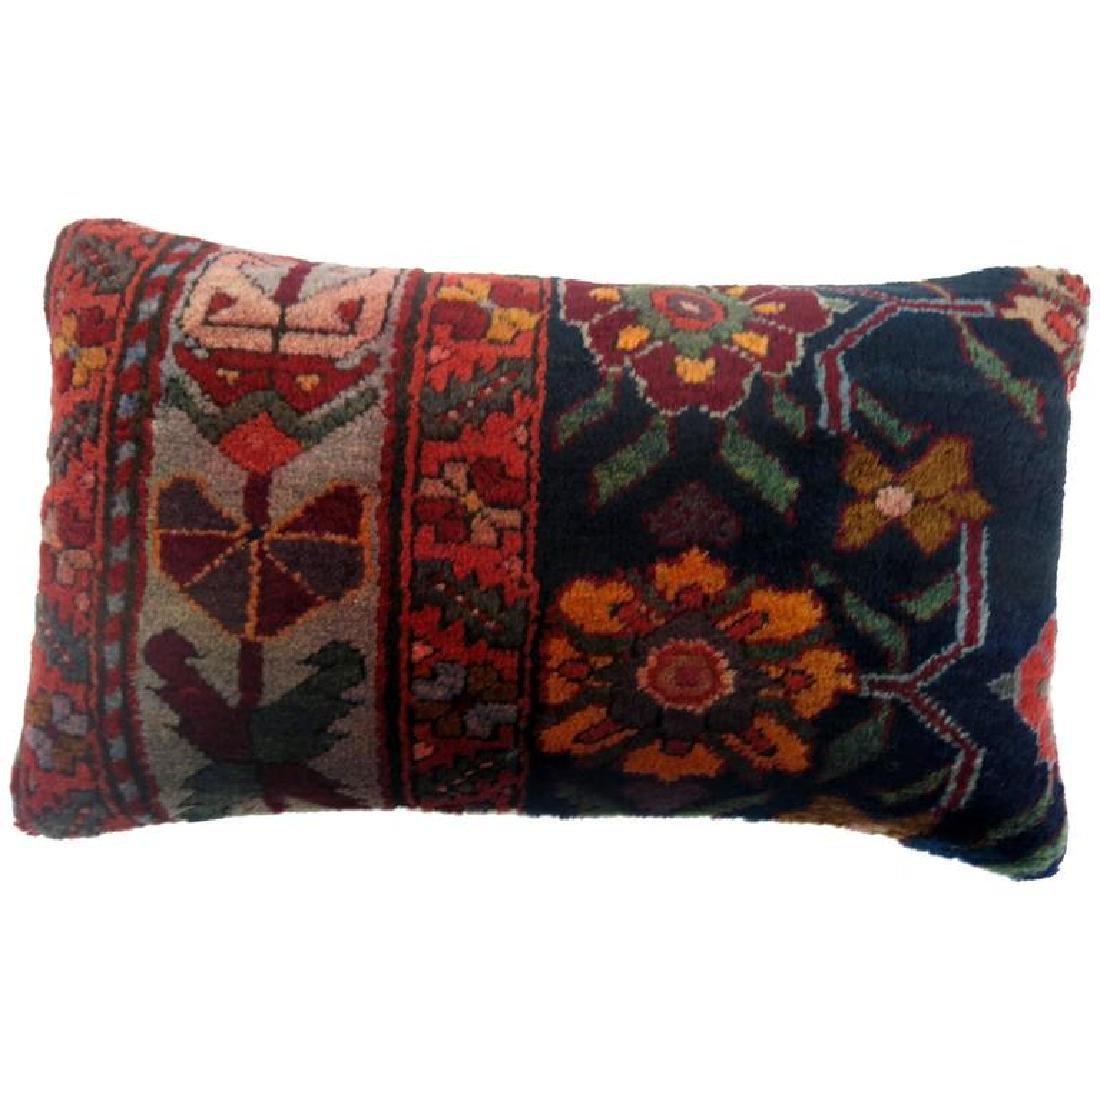 Northwest Persian Rug Pillow 1x1.11